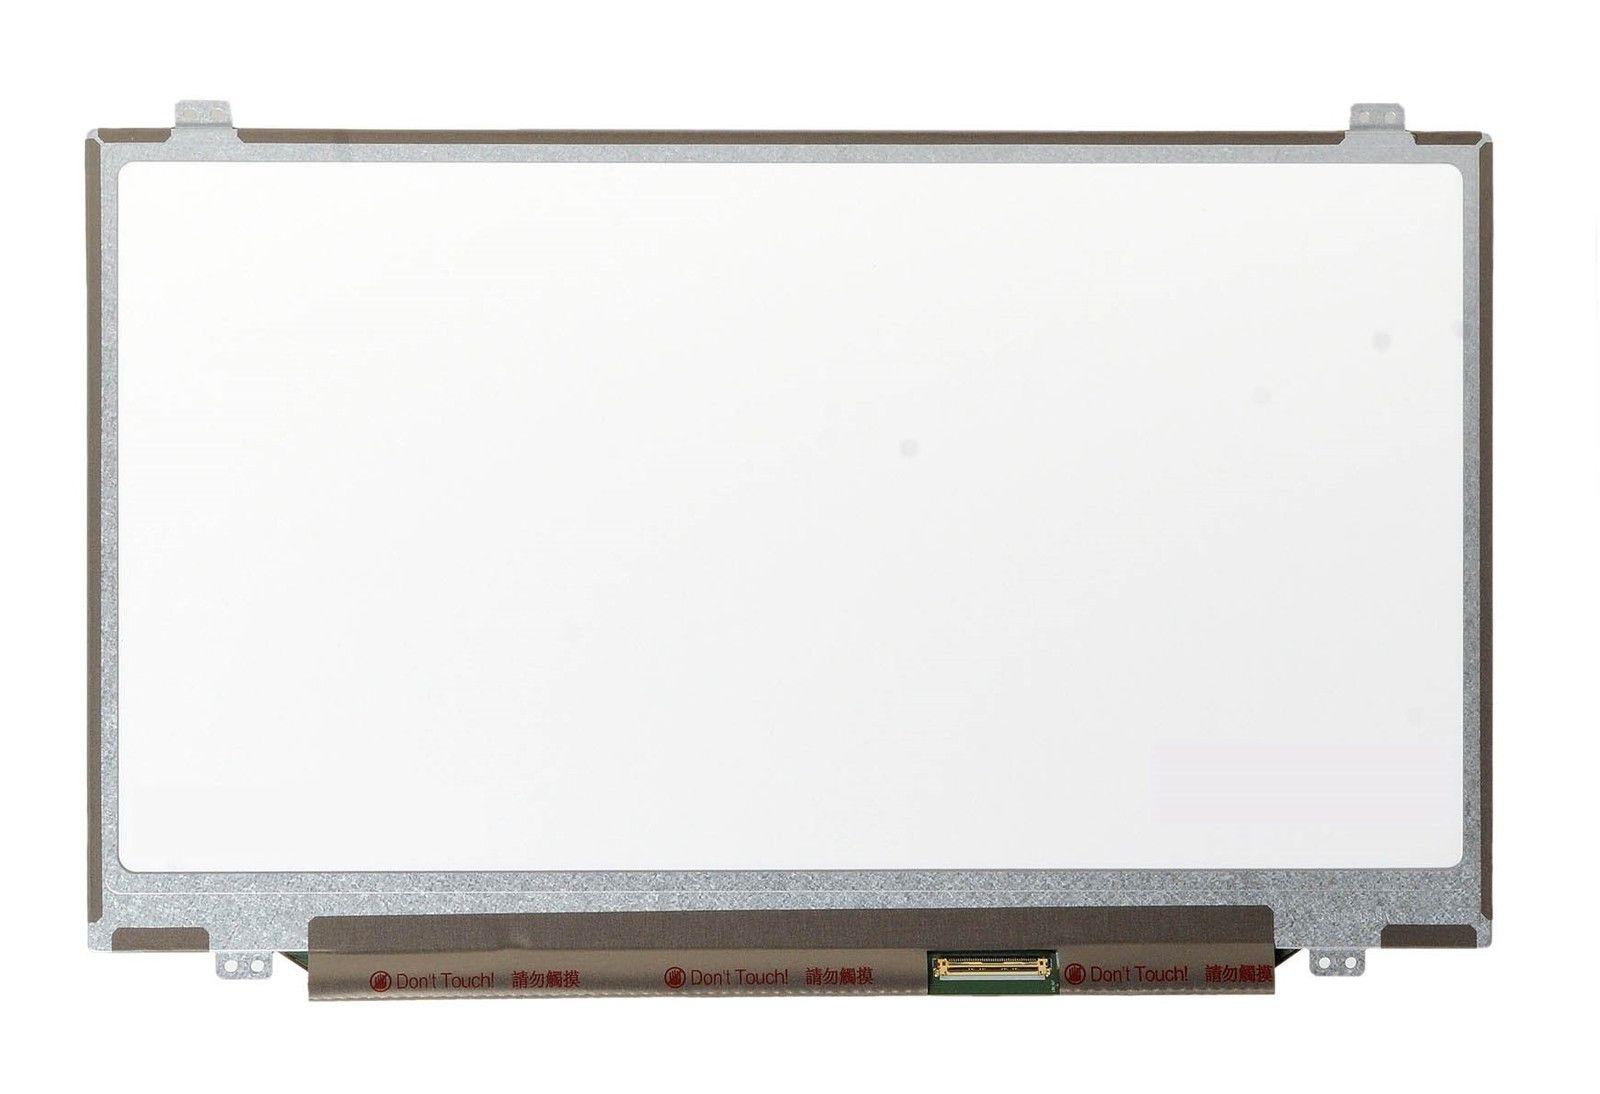 For Asus X401 X401A X401U X401A-RBL4 14.0 LED WXGA HD Slim Replacement LCD Screen for Ultrabook/Notebooks клавиатура topon top 100317 для asus x401 x401a x401u black